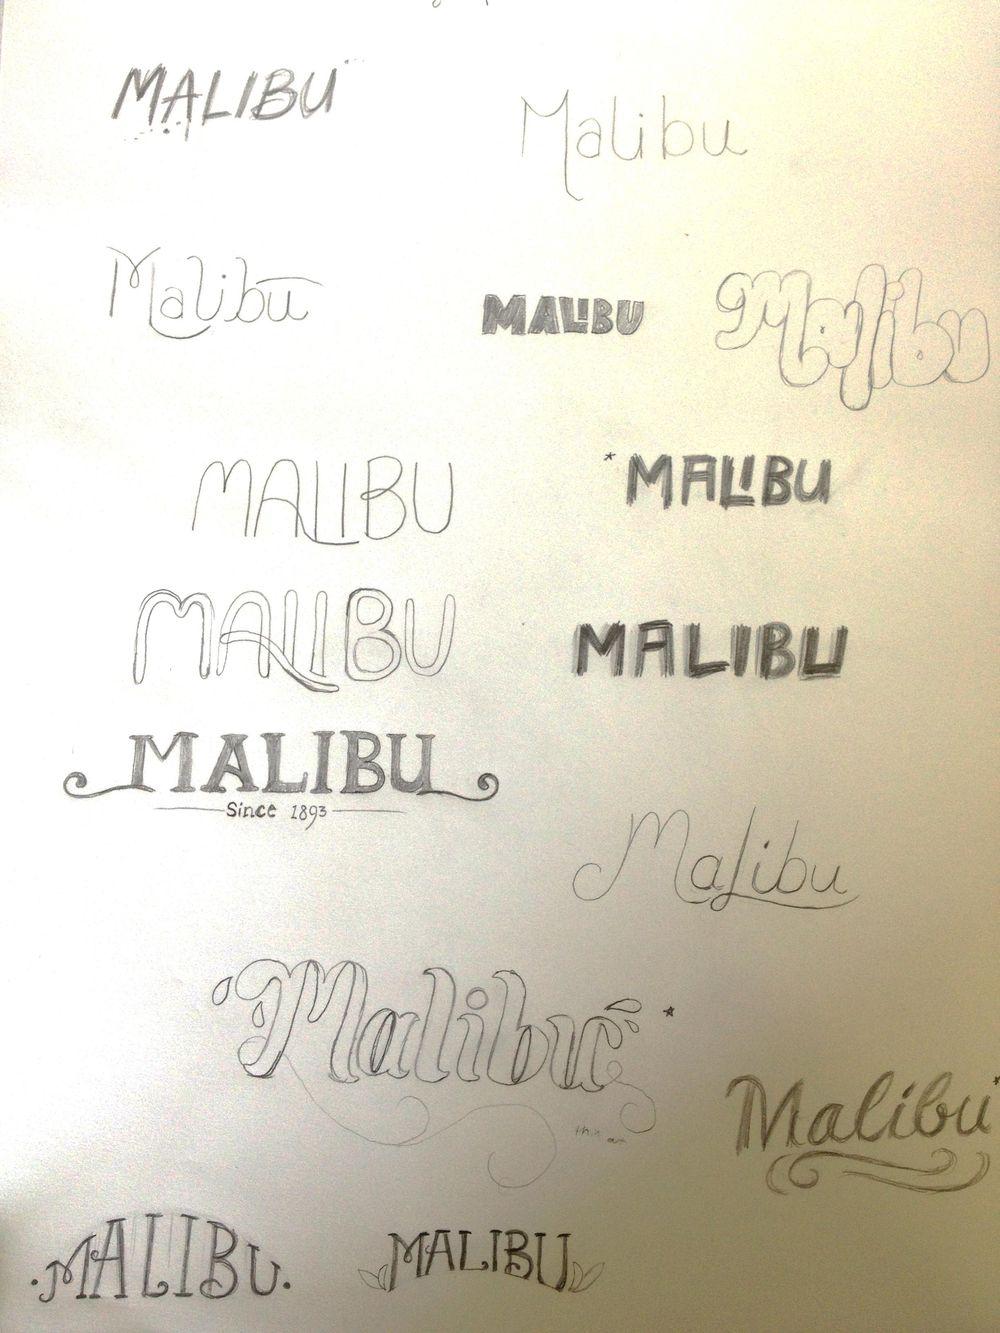 Malibu Rum - image 5 - student project